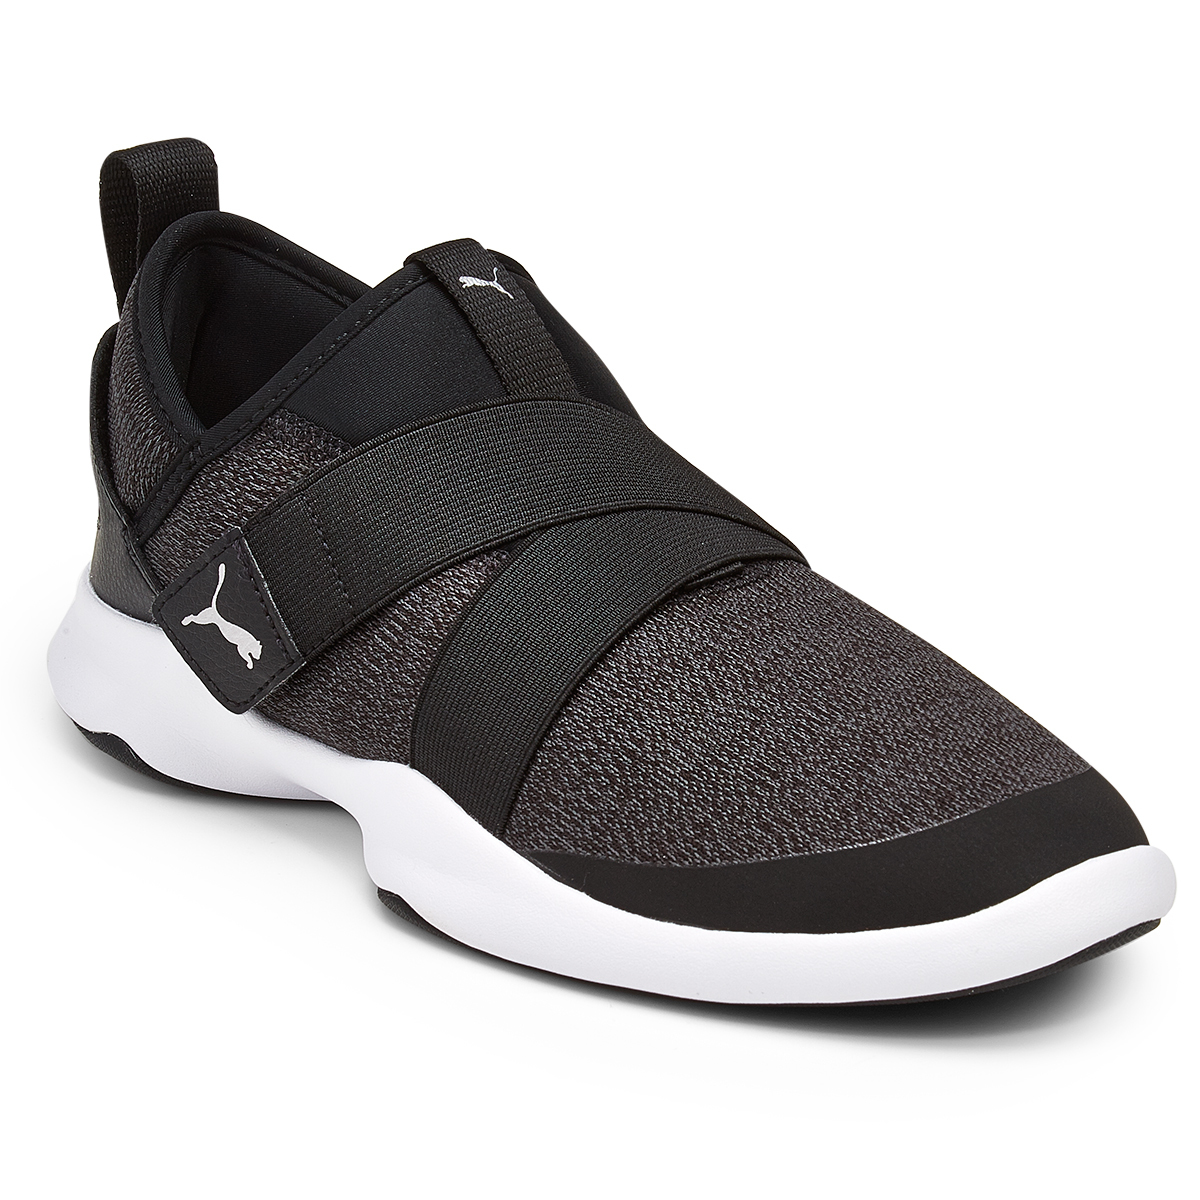 Puma Women's Dare Ac Running Shoes - Black, 6